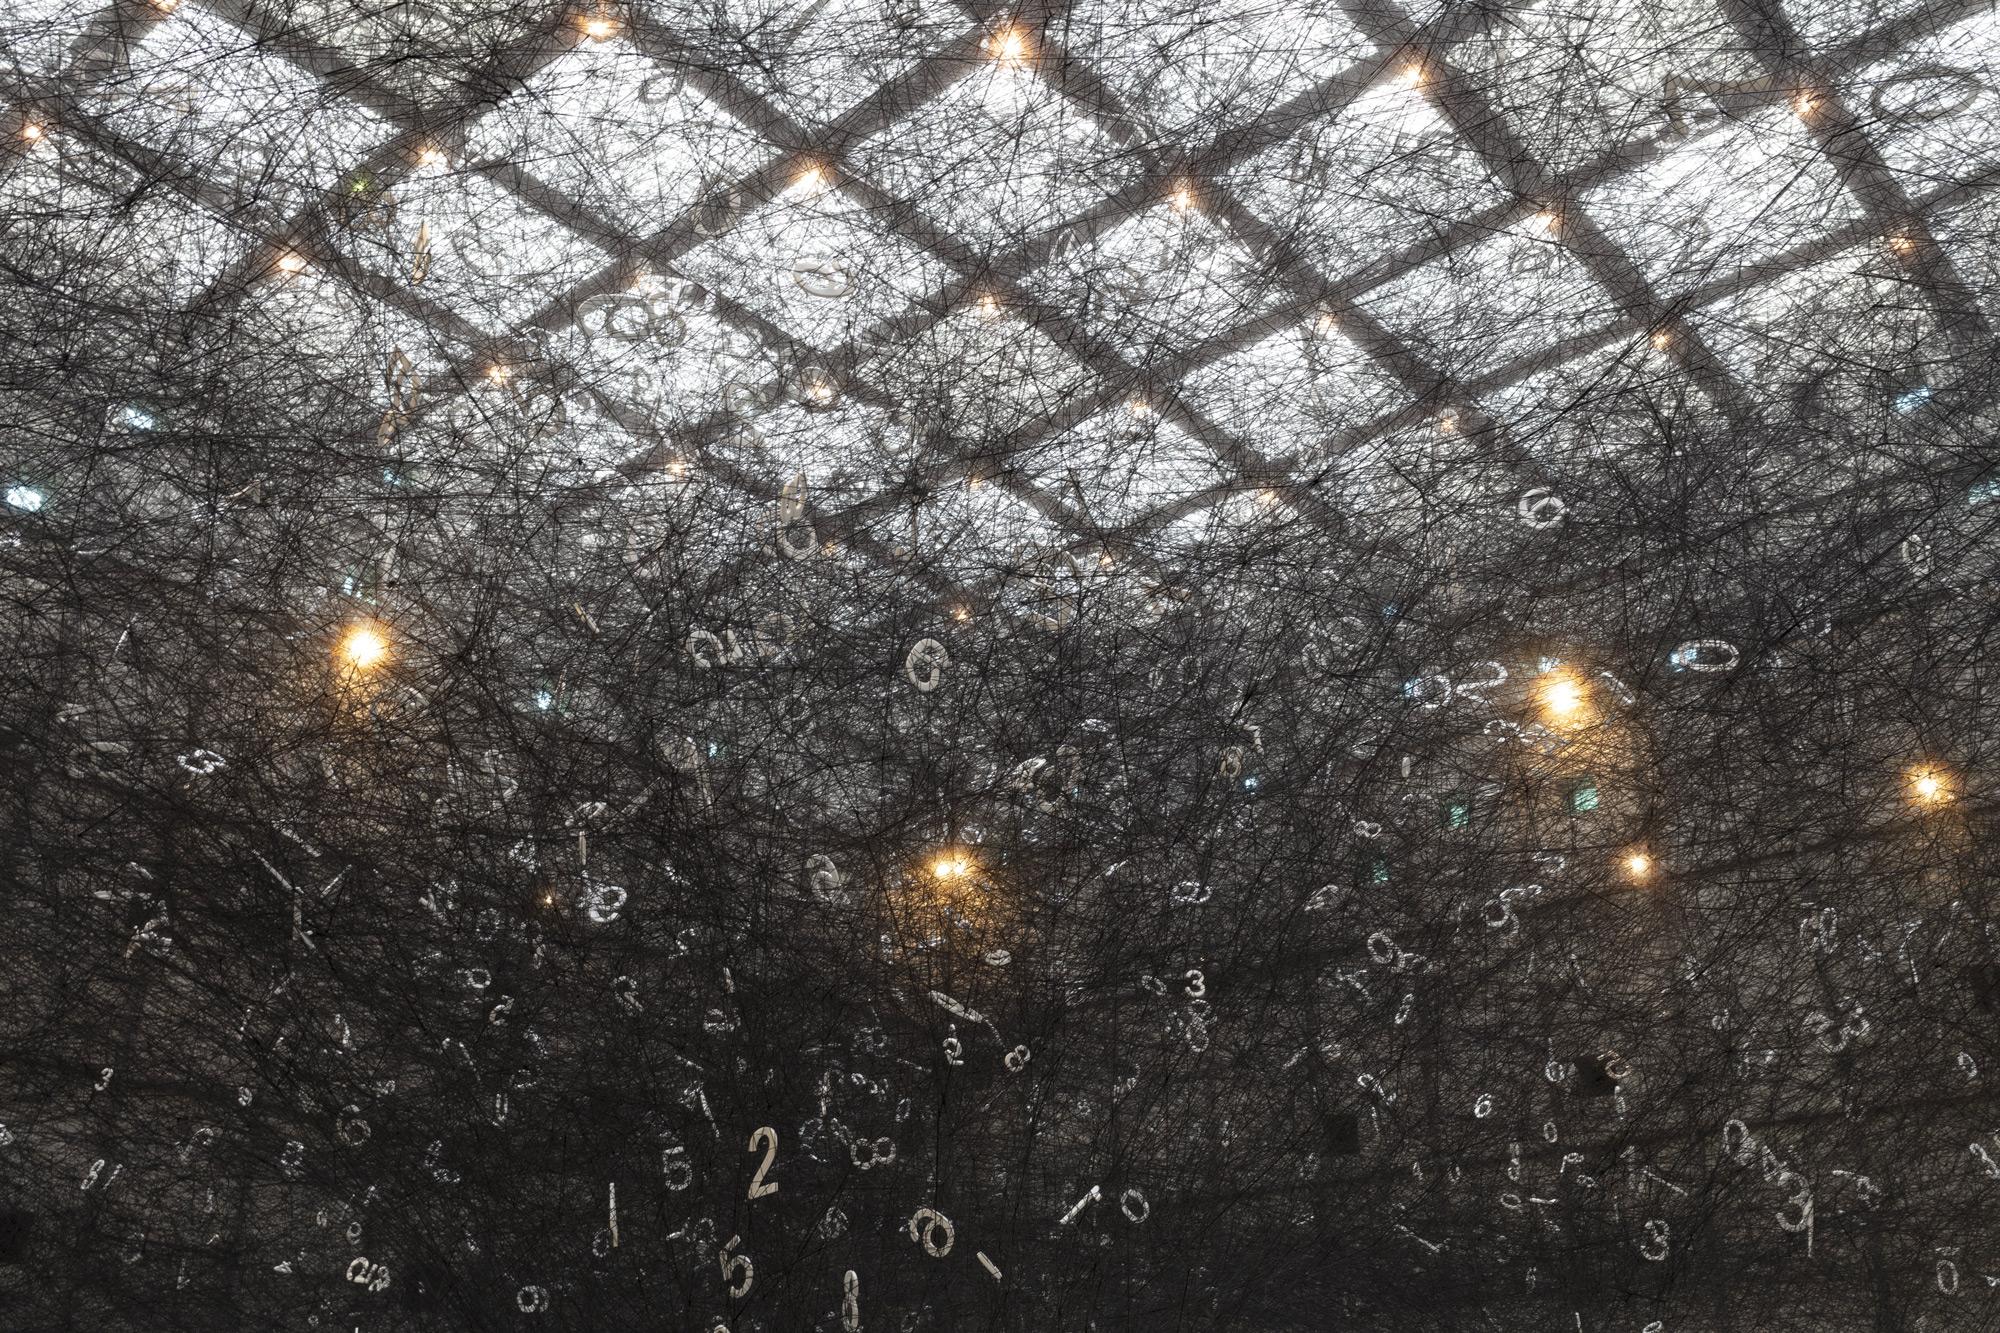 Chiharu Shiota's interactive installation celebrates numbers